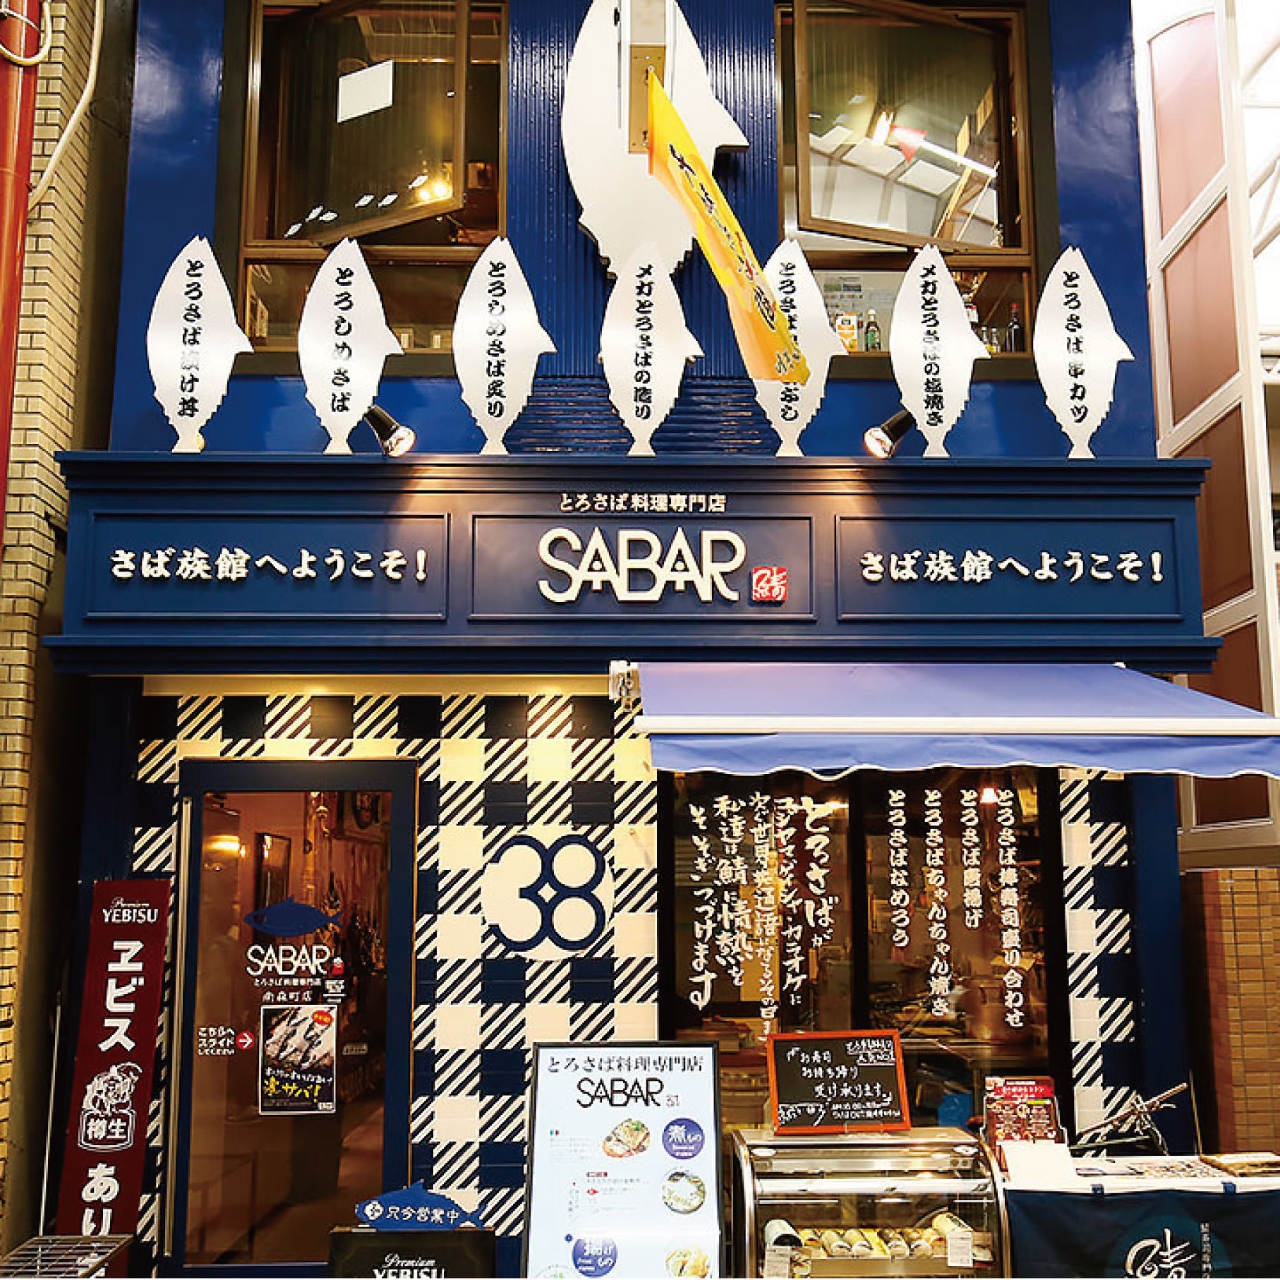 地下鉄「南森町」駅&JR「大阪天満宮」駅より徒歩1分!